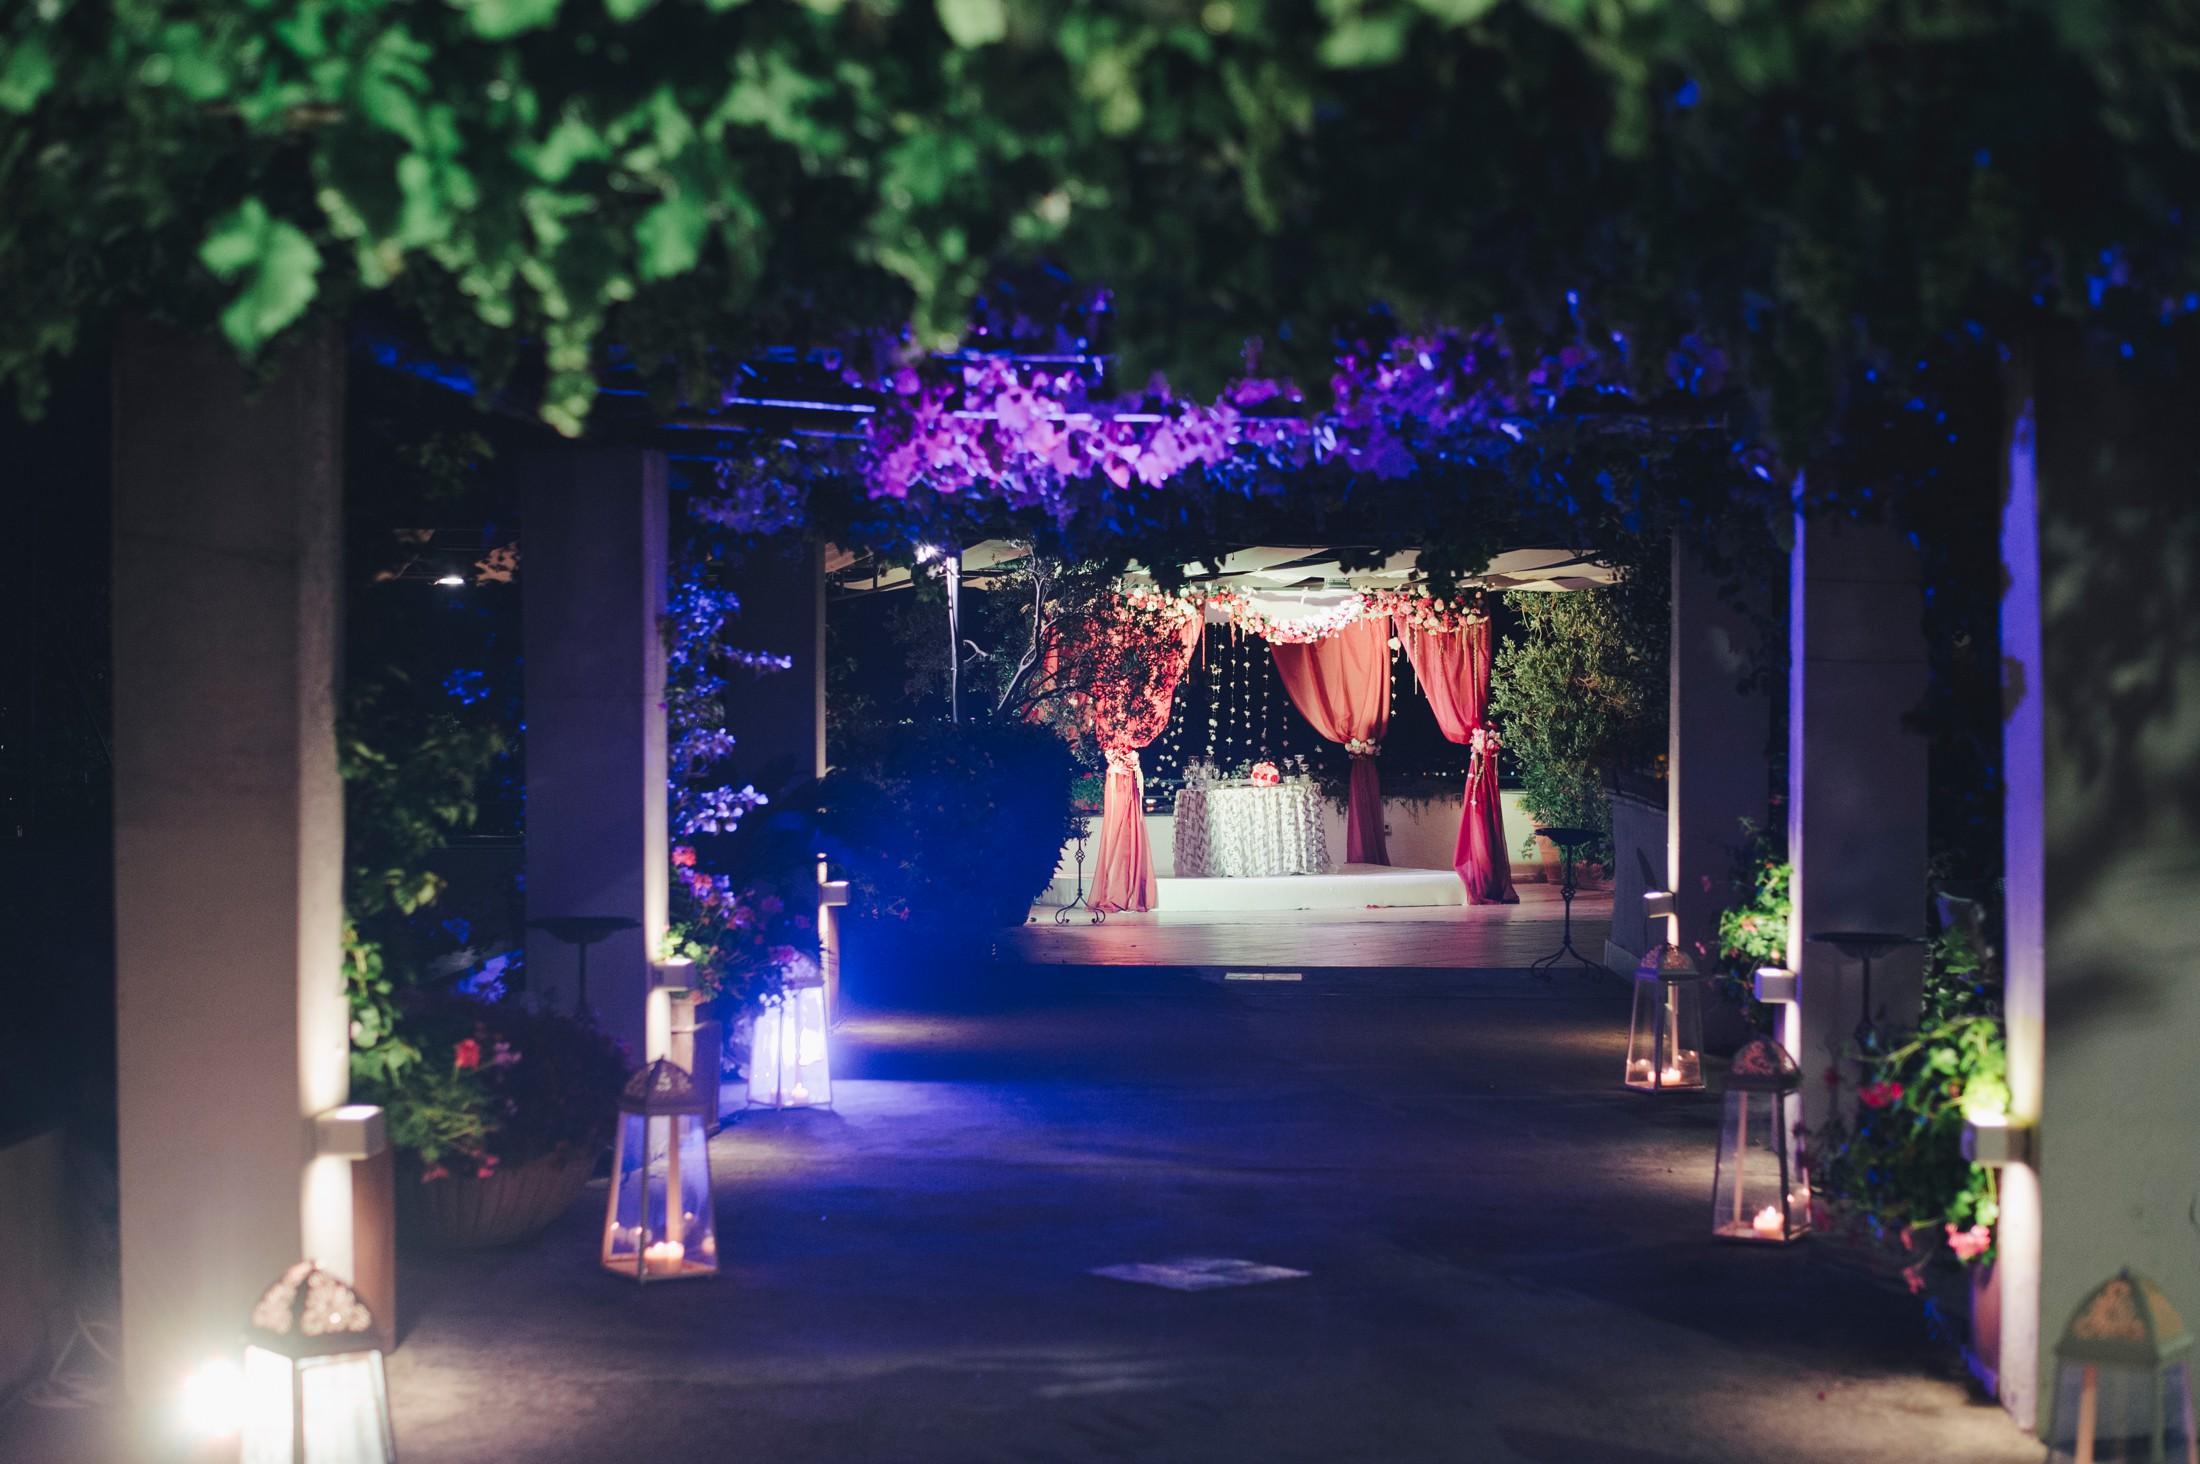 hotel san francesco al monte wedding location by night